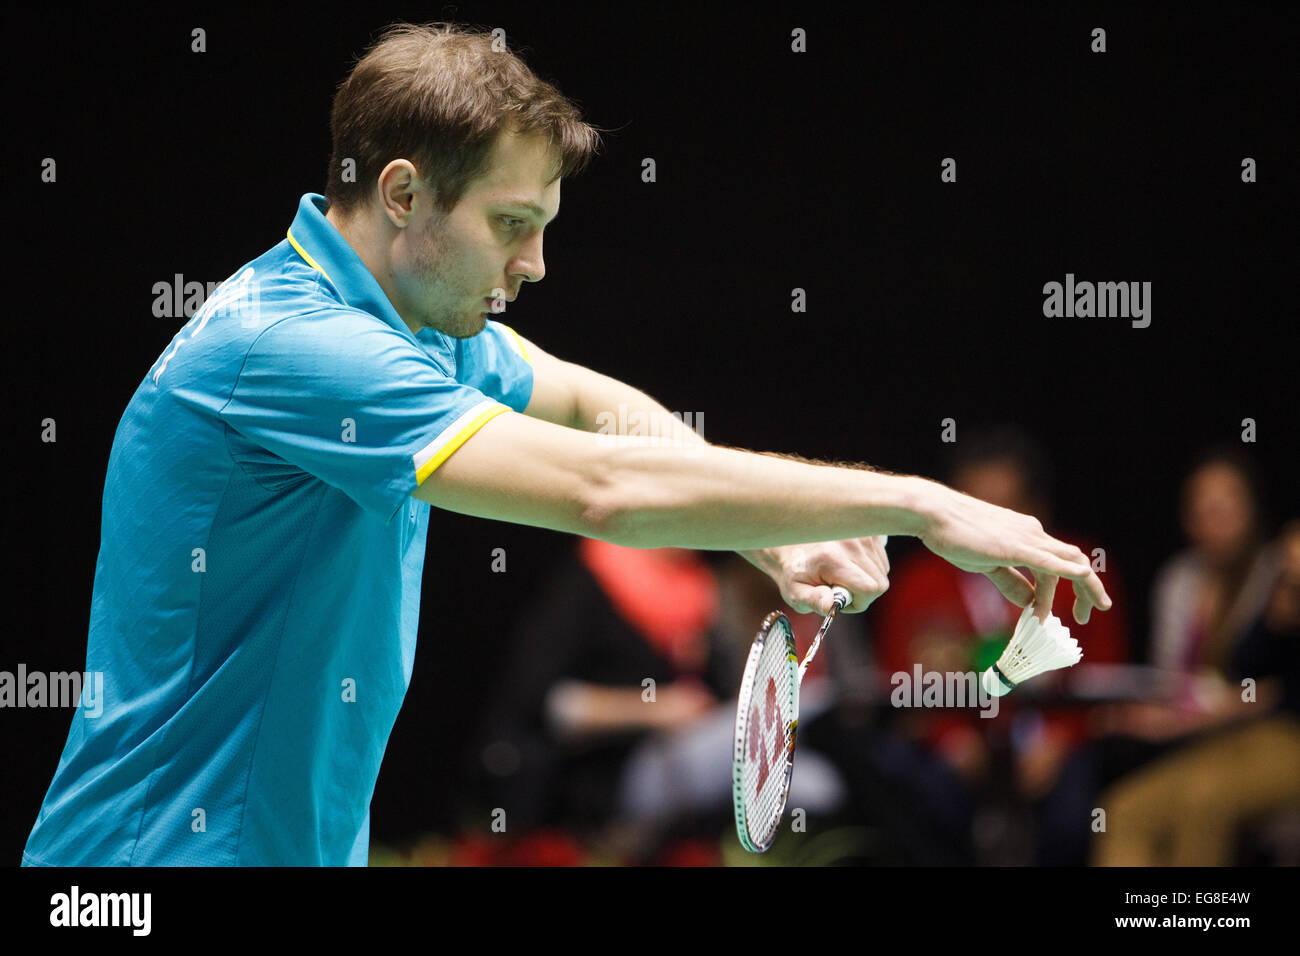 LEUVEN BELGIUM 14 02 2015 Badminton players Ivan Sozonov Stock